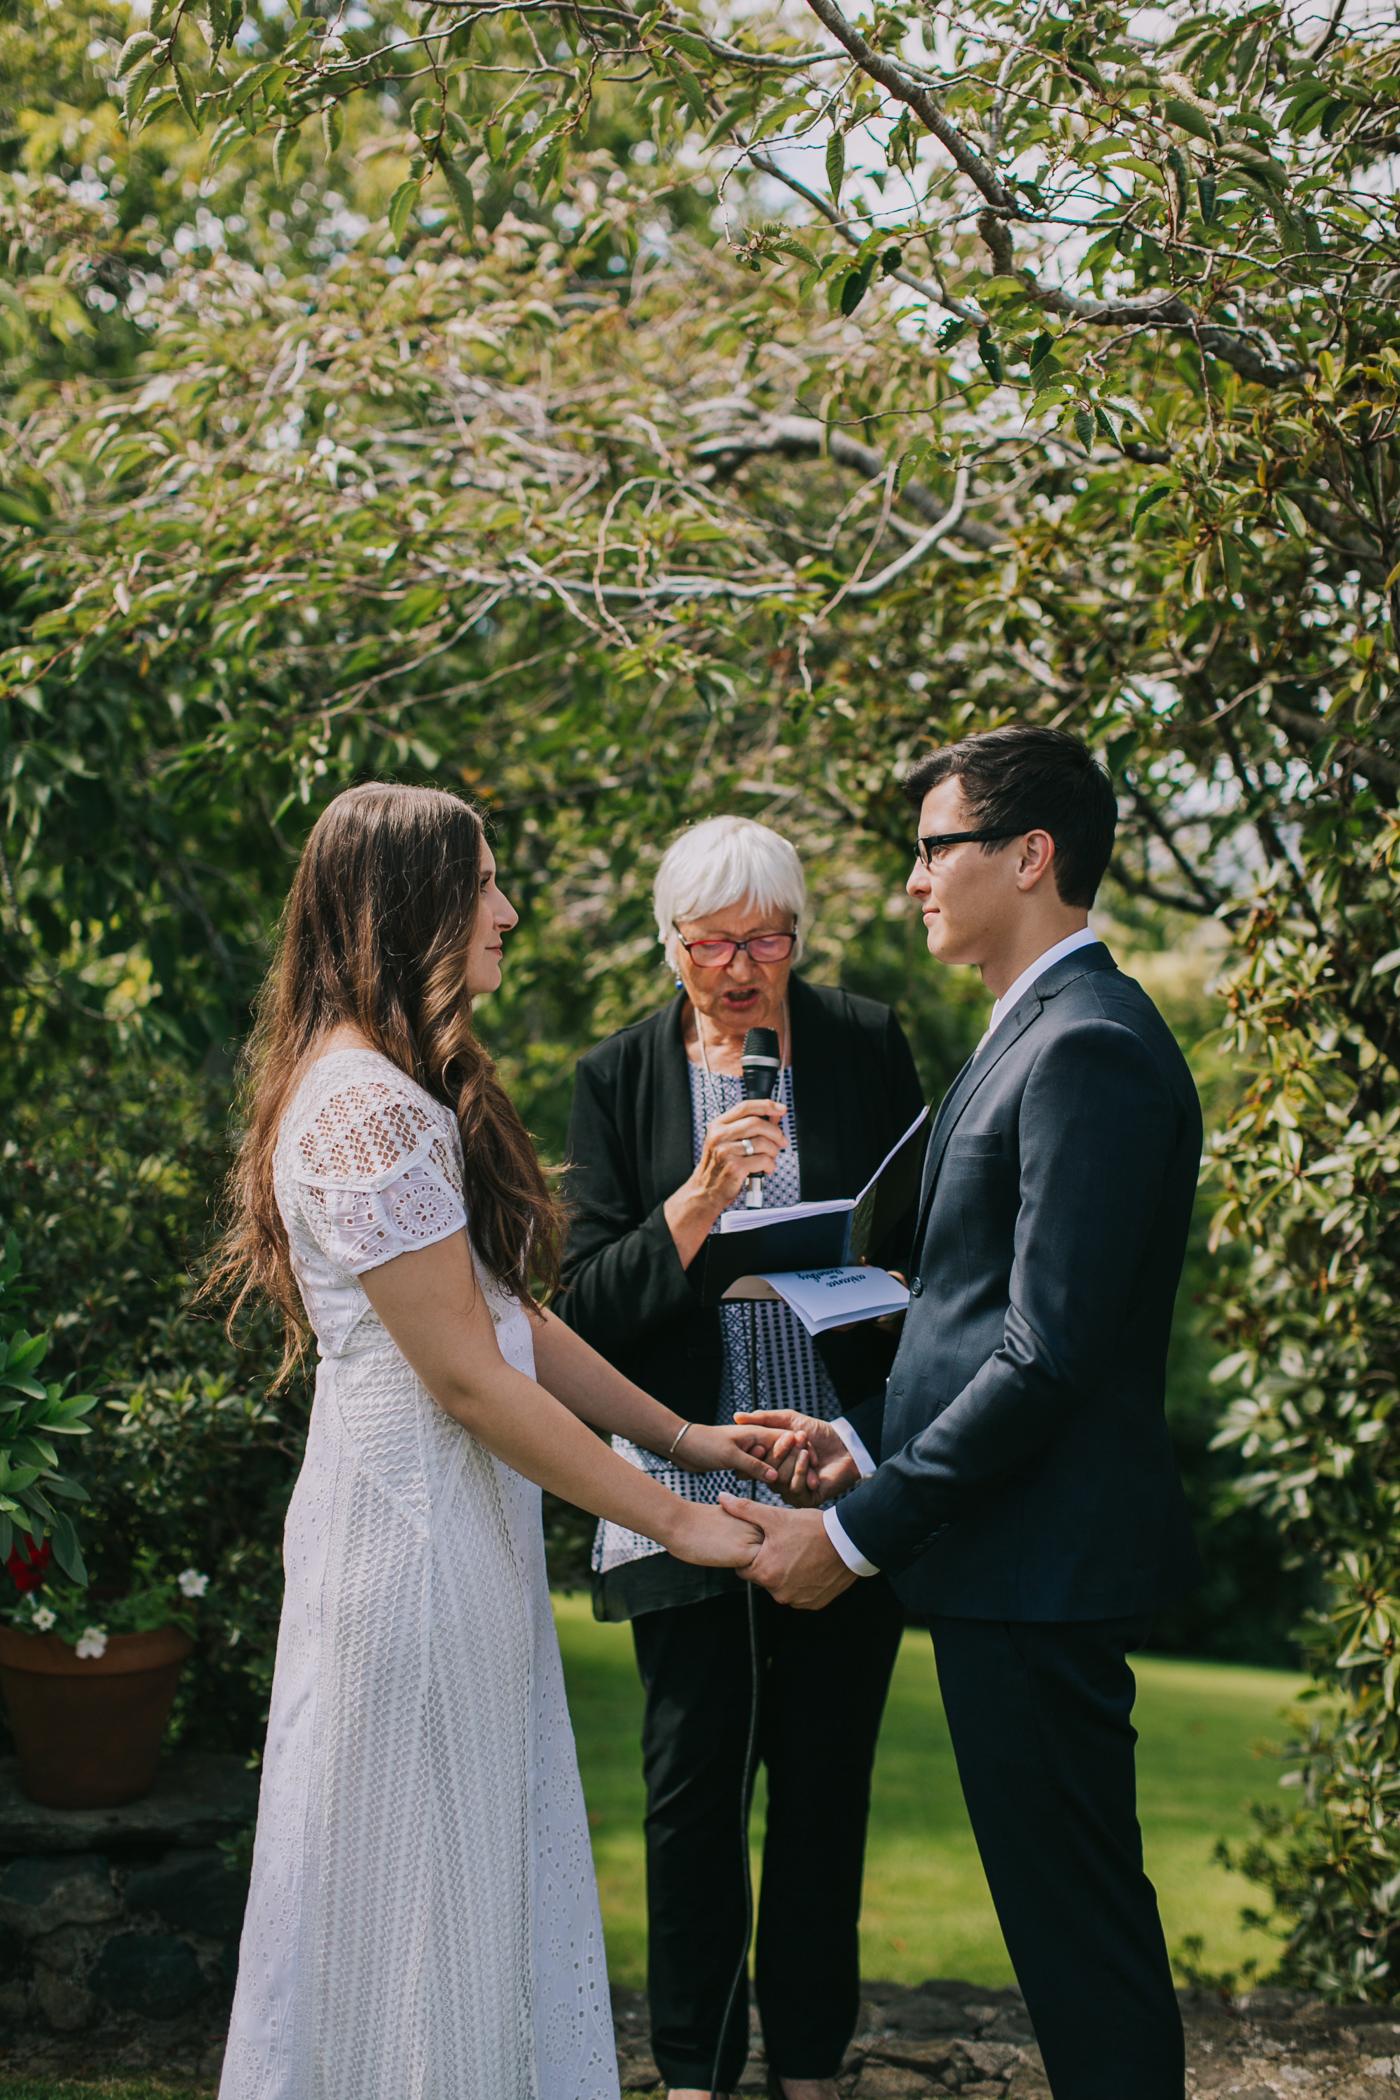 Ariana & Tim - Dunedin, New Zealand Wedding - Destination Wedding - Samantha Heather Photography-97.jpg